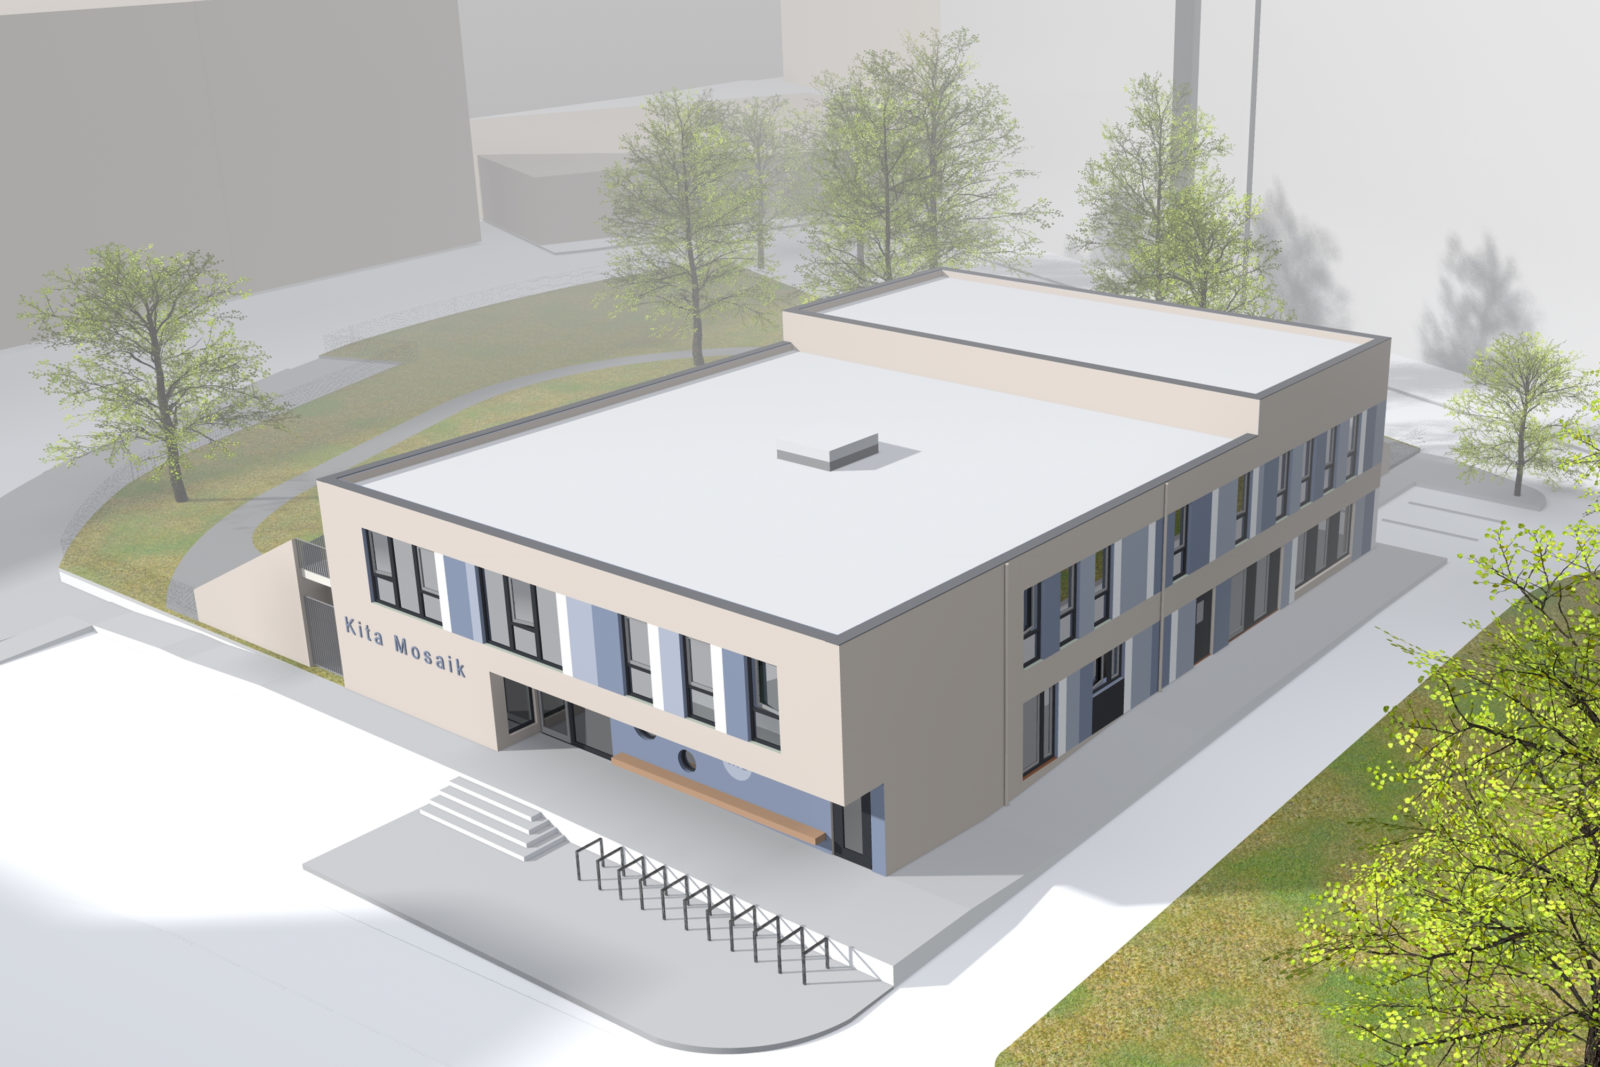 Neubau Kita Mosaik in Leipizg, Zentrum Süd - Vogelperspektive